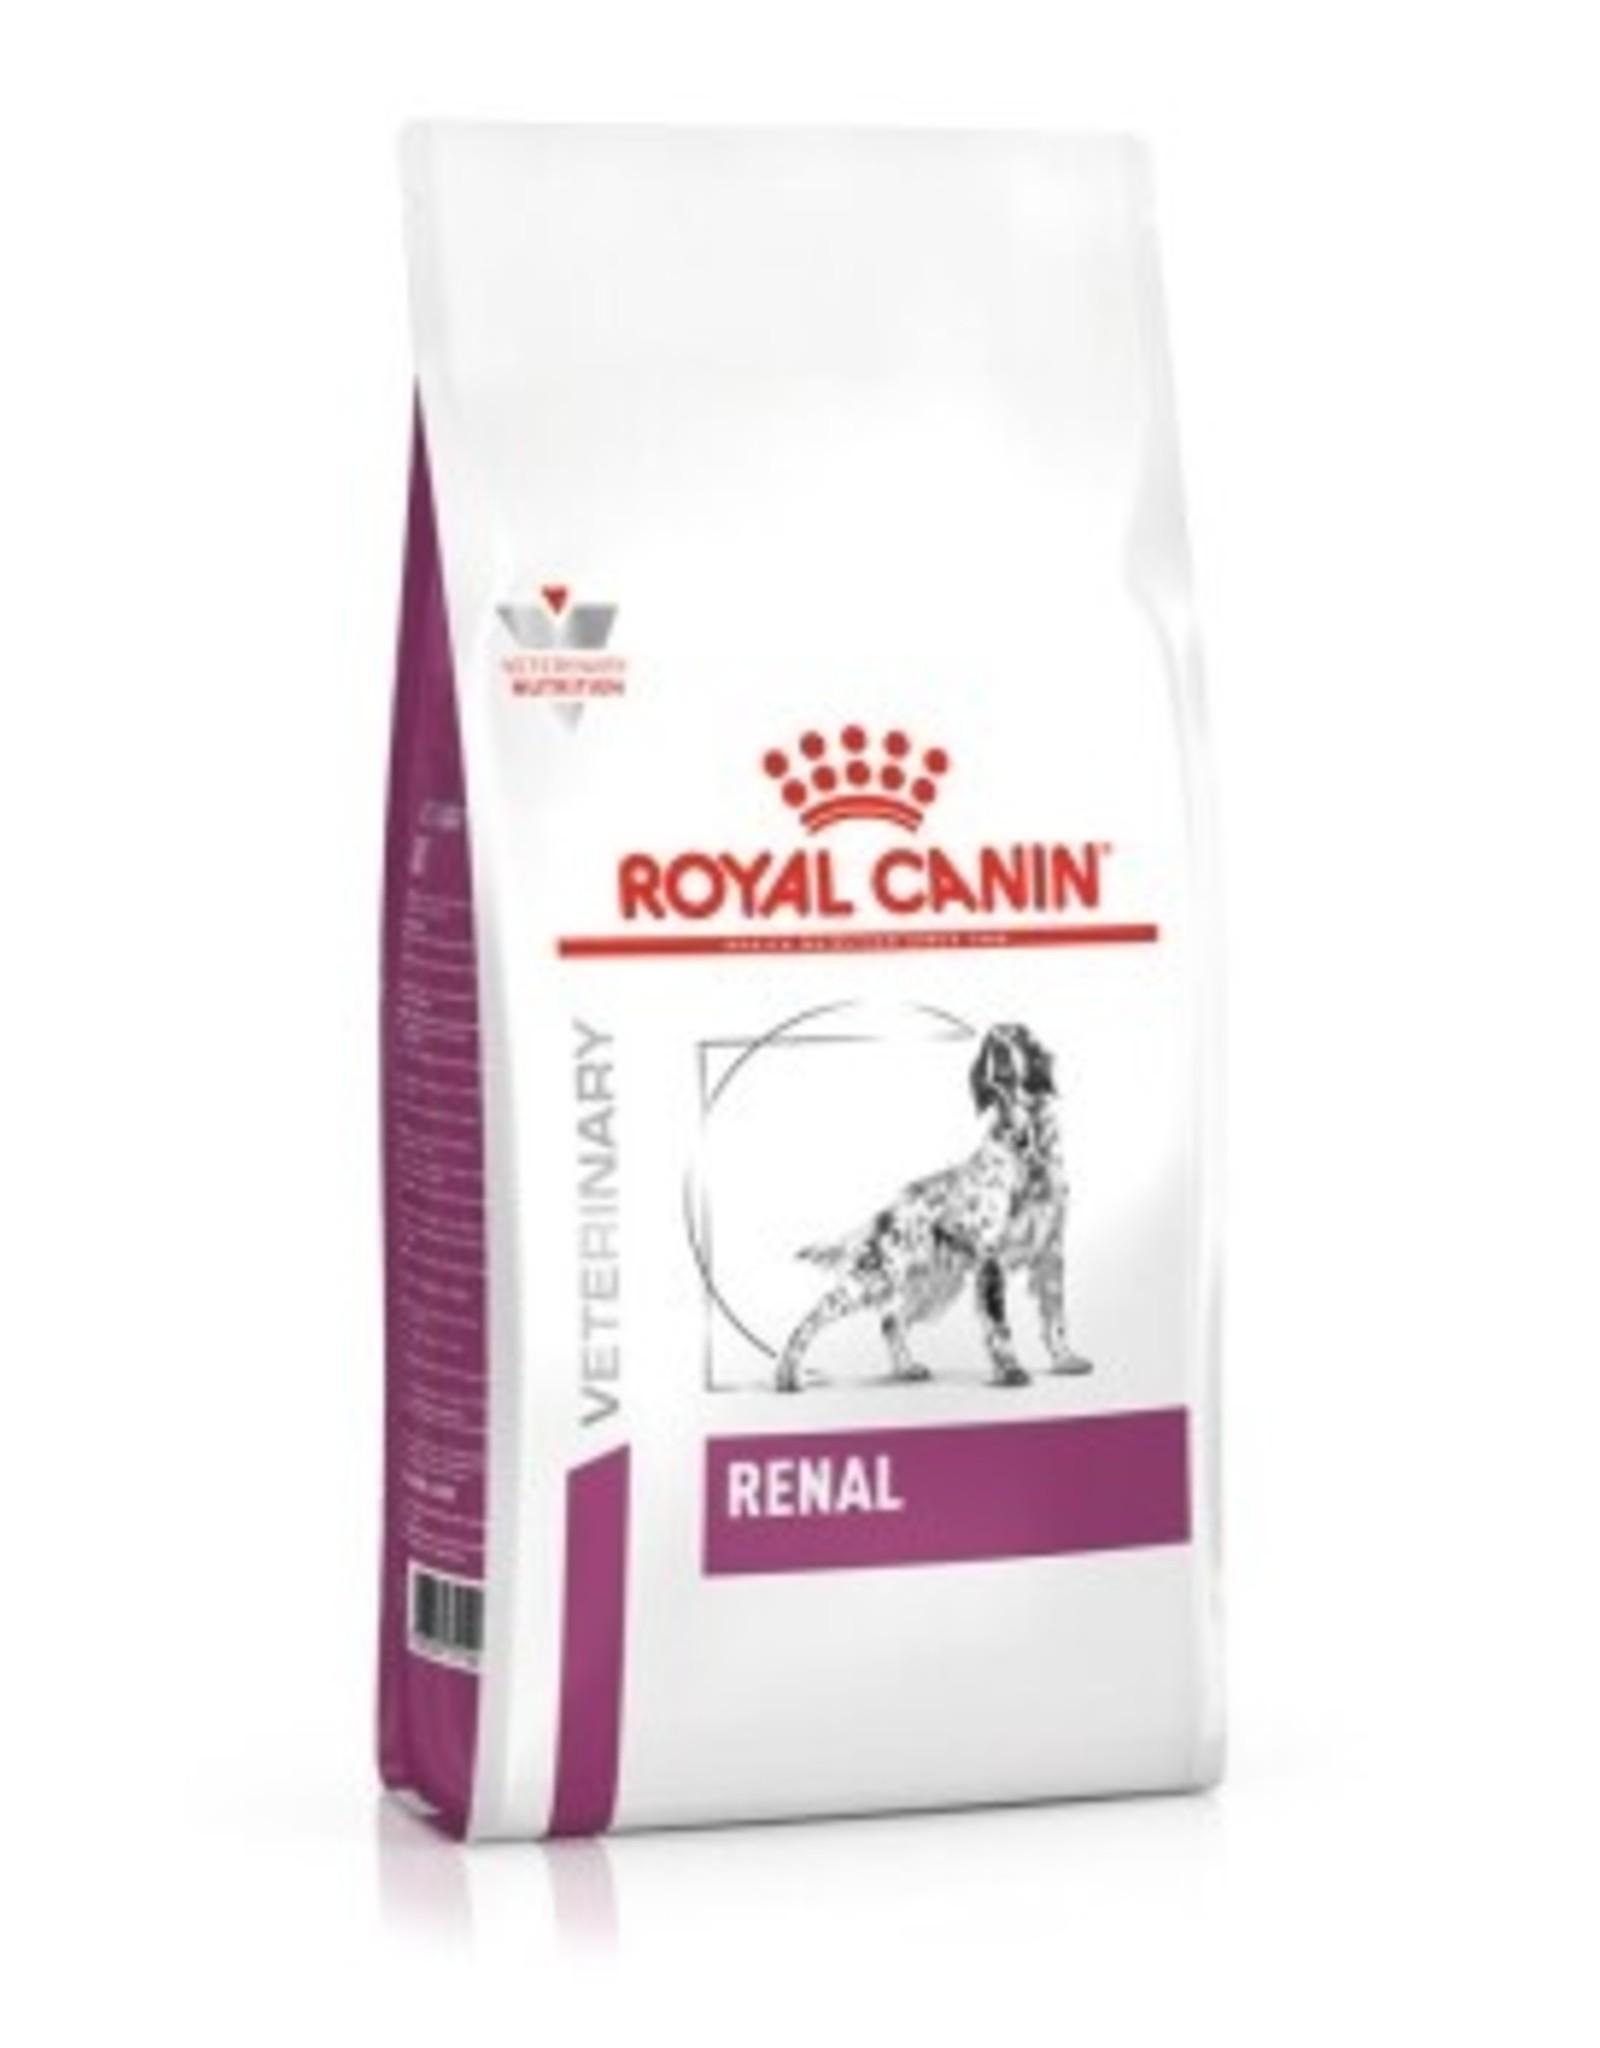 Royal Canin Royal Canin Vdiet Renal Hond 7kg